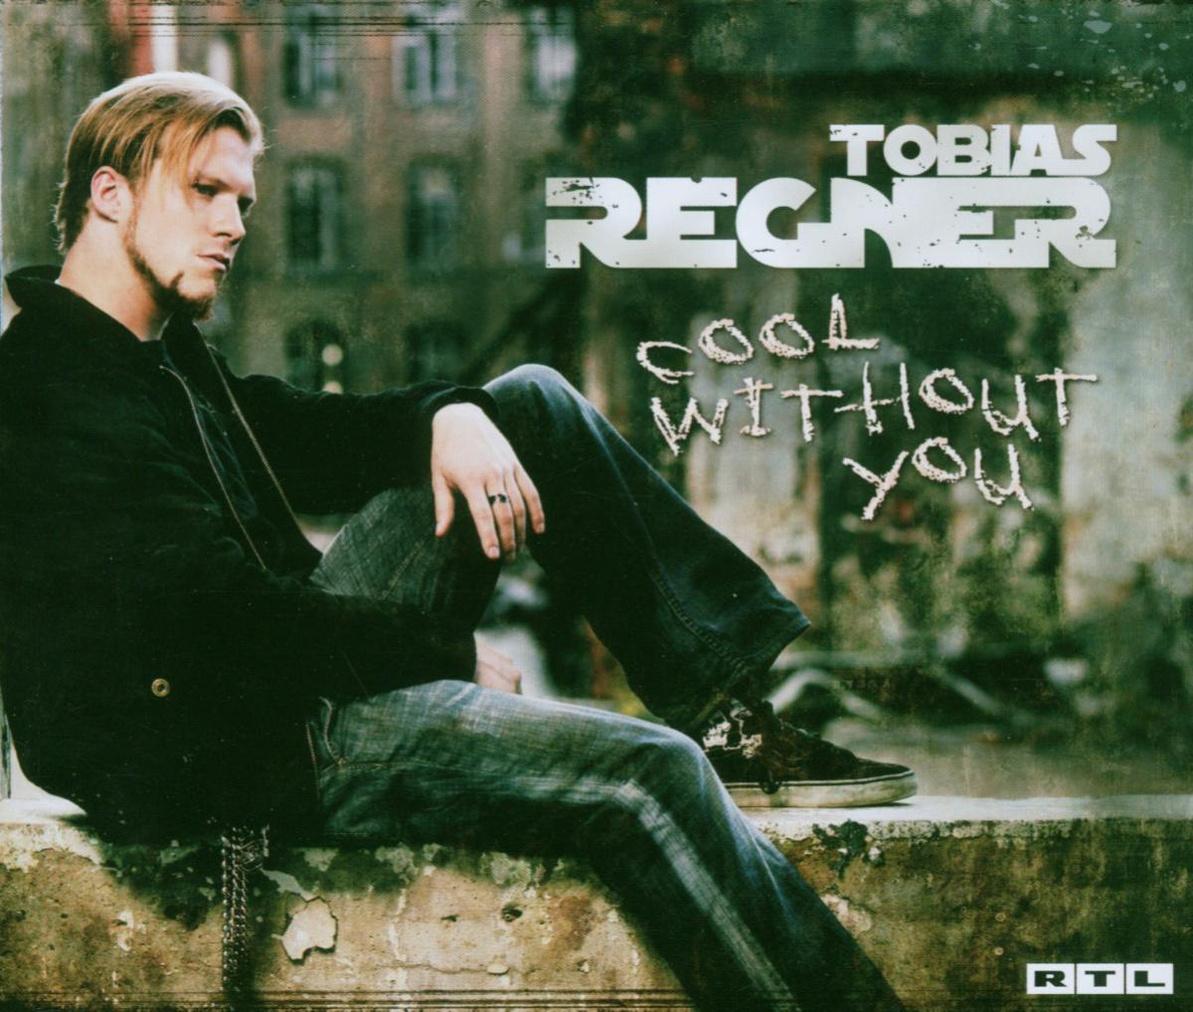 Tobias Regner - Cool Without You/Premium